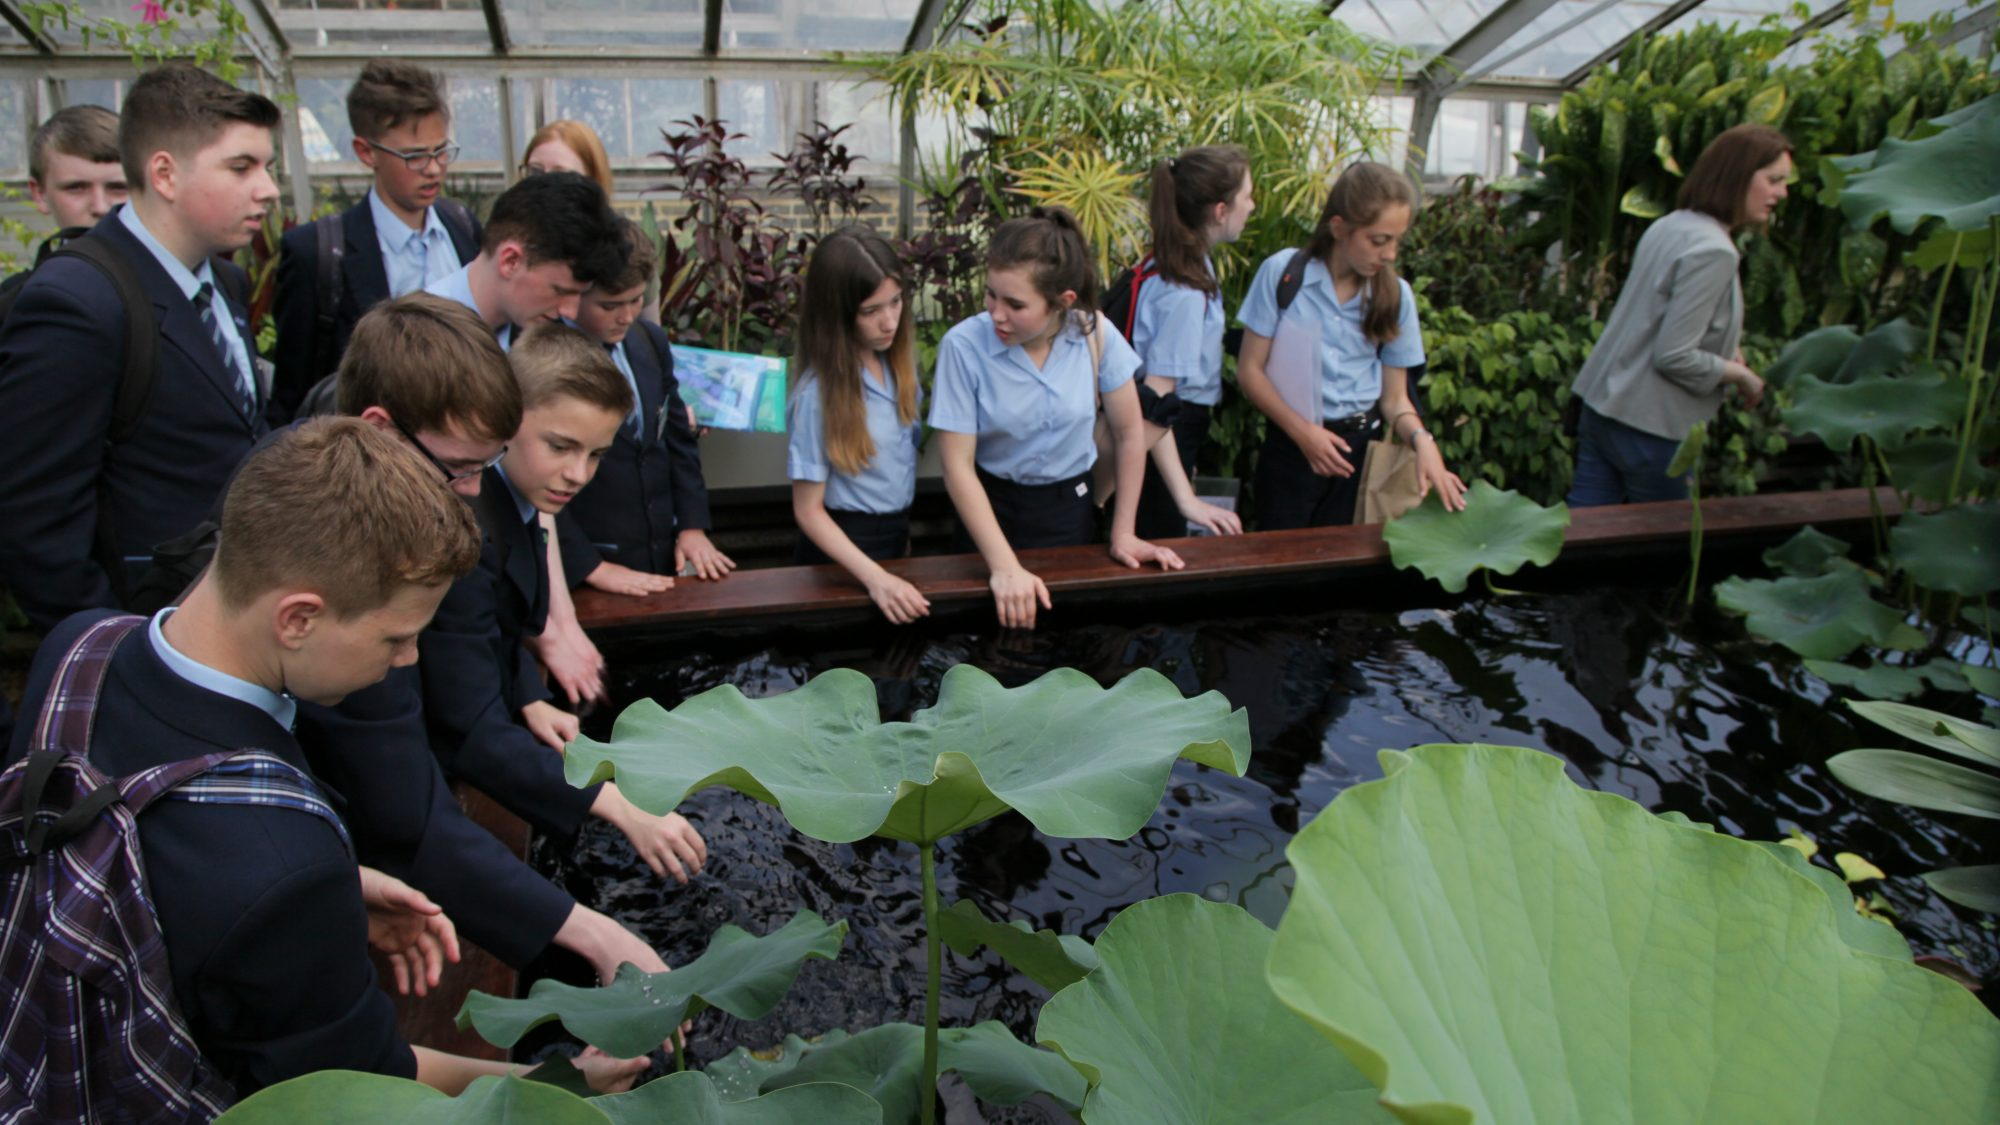 Students studying the Sacred Lotus, growing in tropical glasshouse at Cambridge University Botanic Garden.